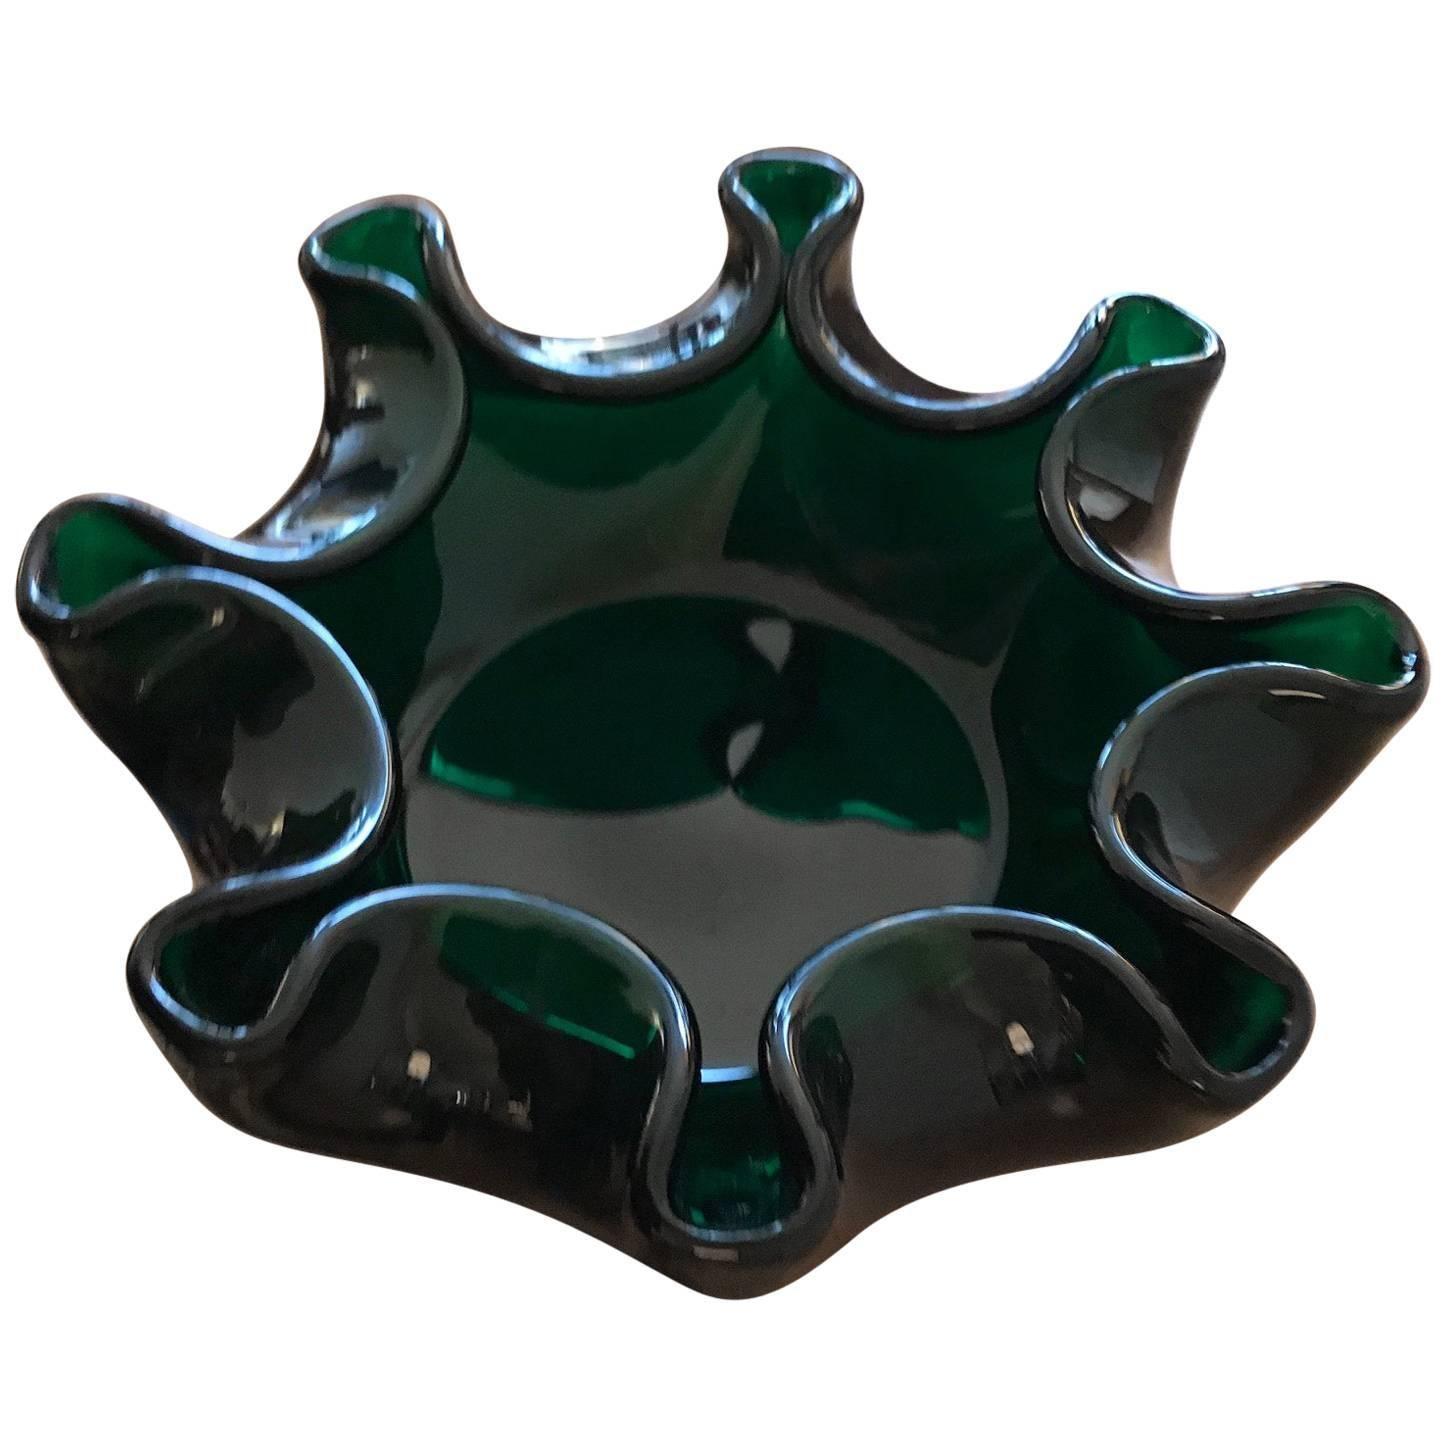 Murano Sommerso Italian Art Glass Centerpiece Bowl